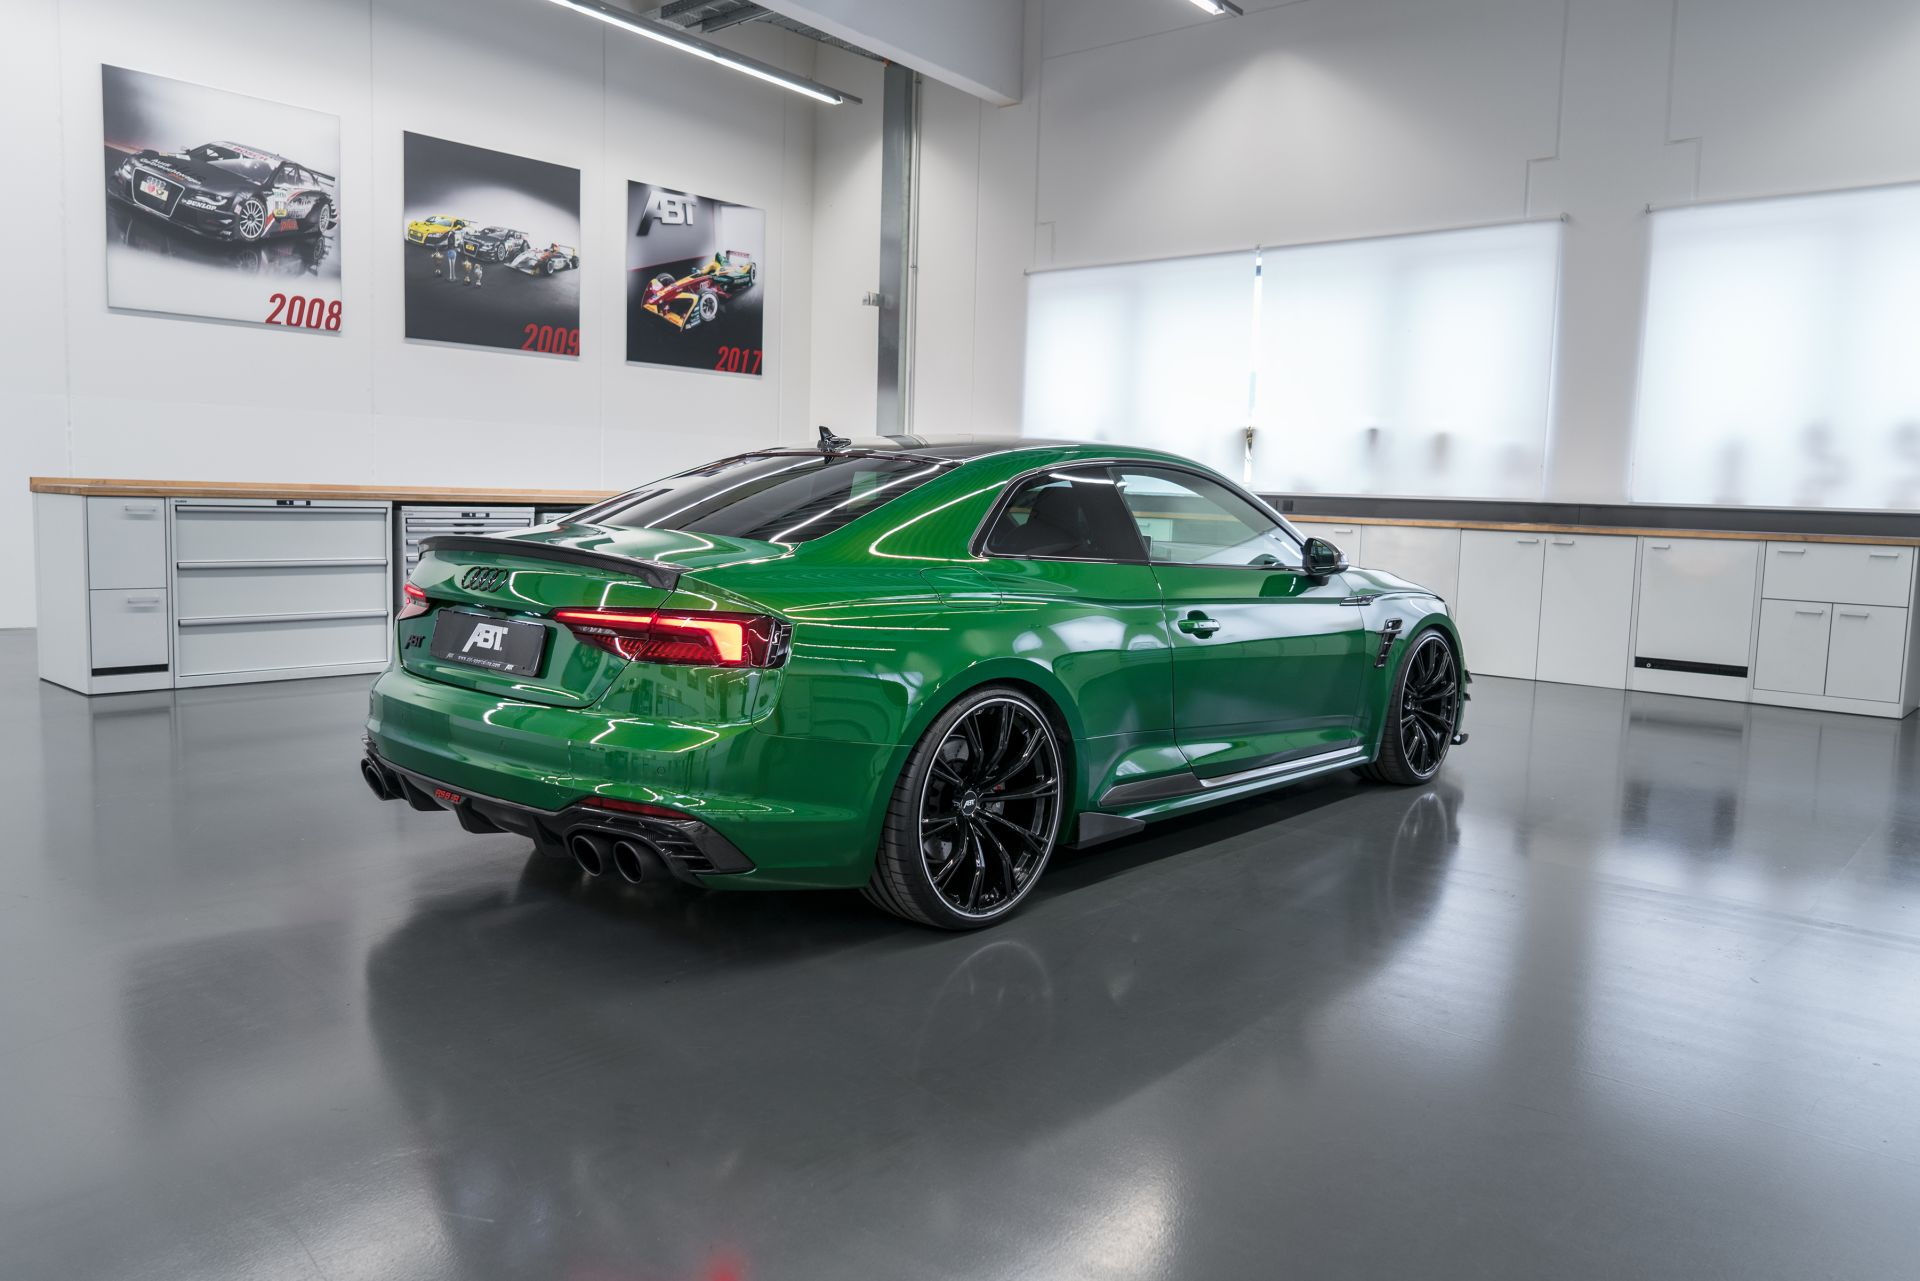 Abt RS5-R – German tuner takes Audi RS5 beyond 500bhp | Evo